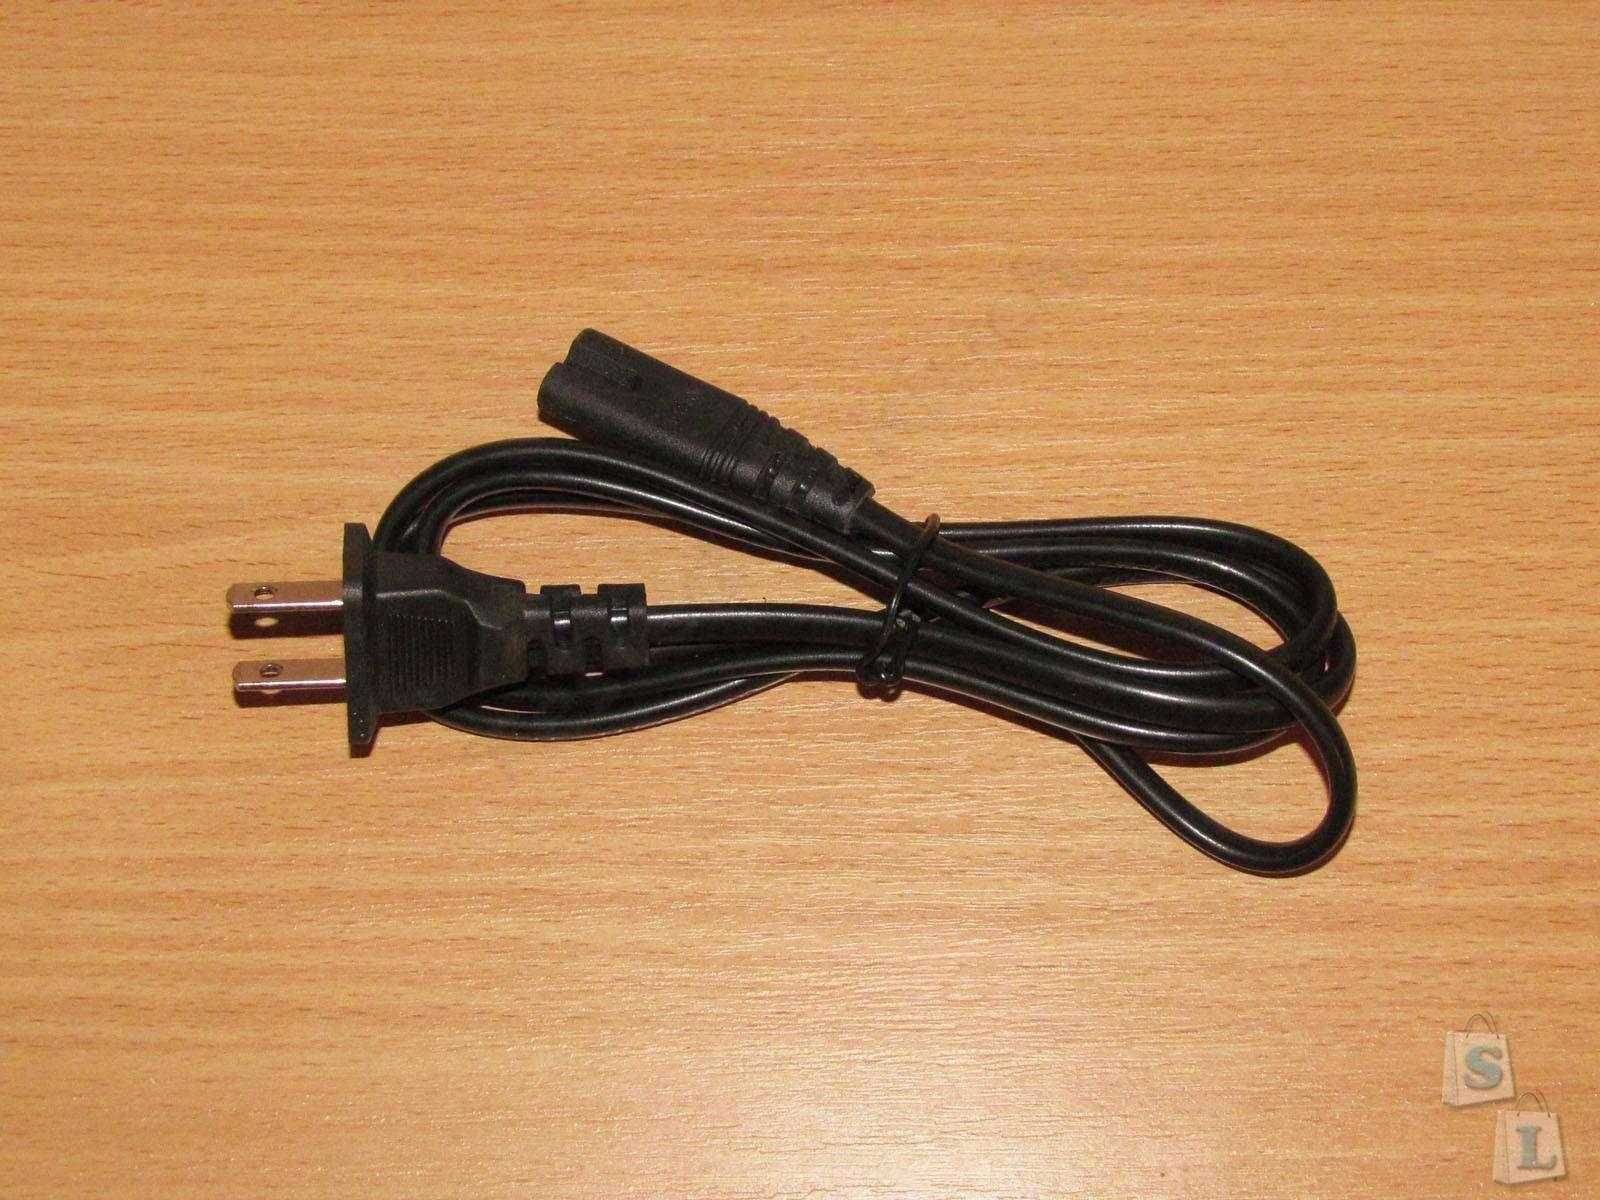 ChinaBuye: Nitecore i2, довольно неплохое зарядное устройство для Li-ion, Ni-MH и Ni-Cd аккумуляторов.